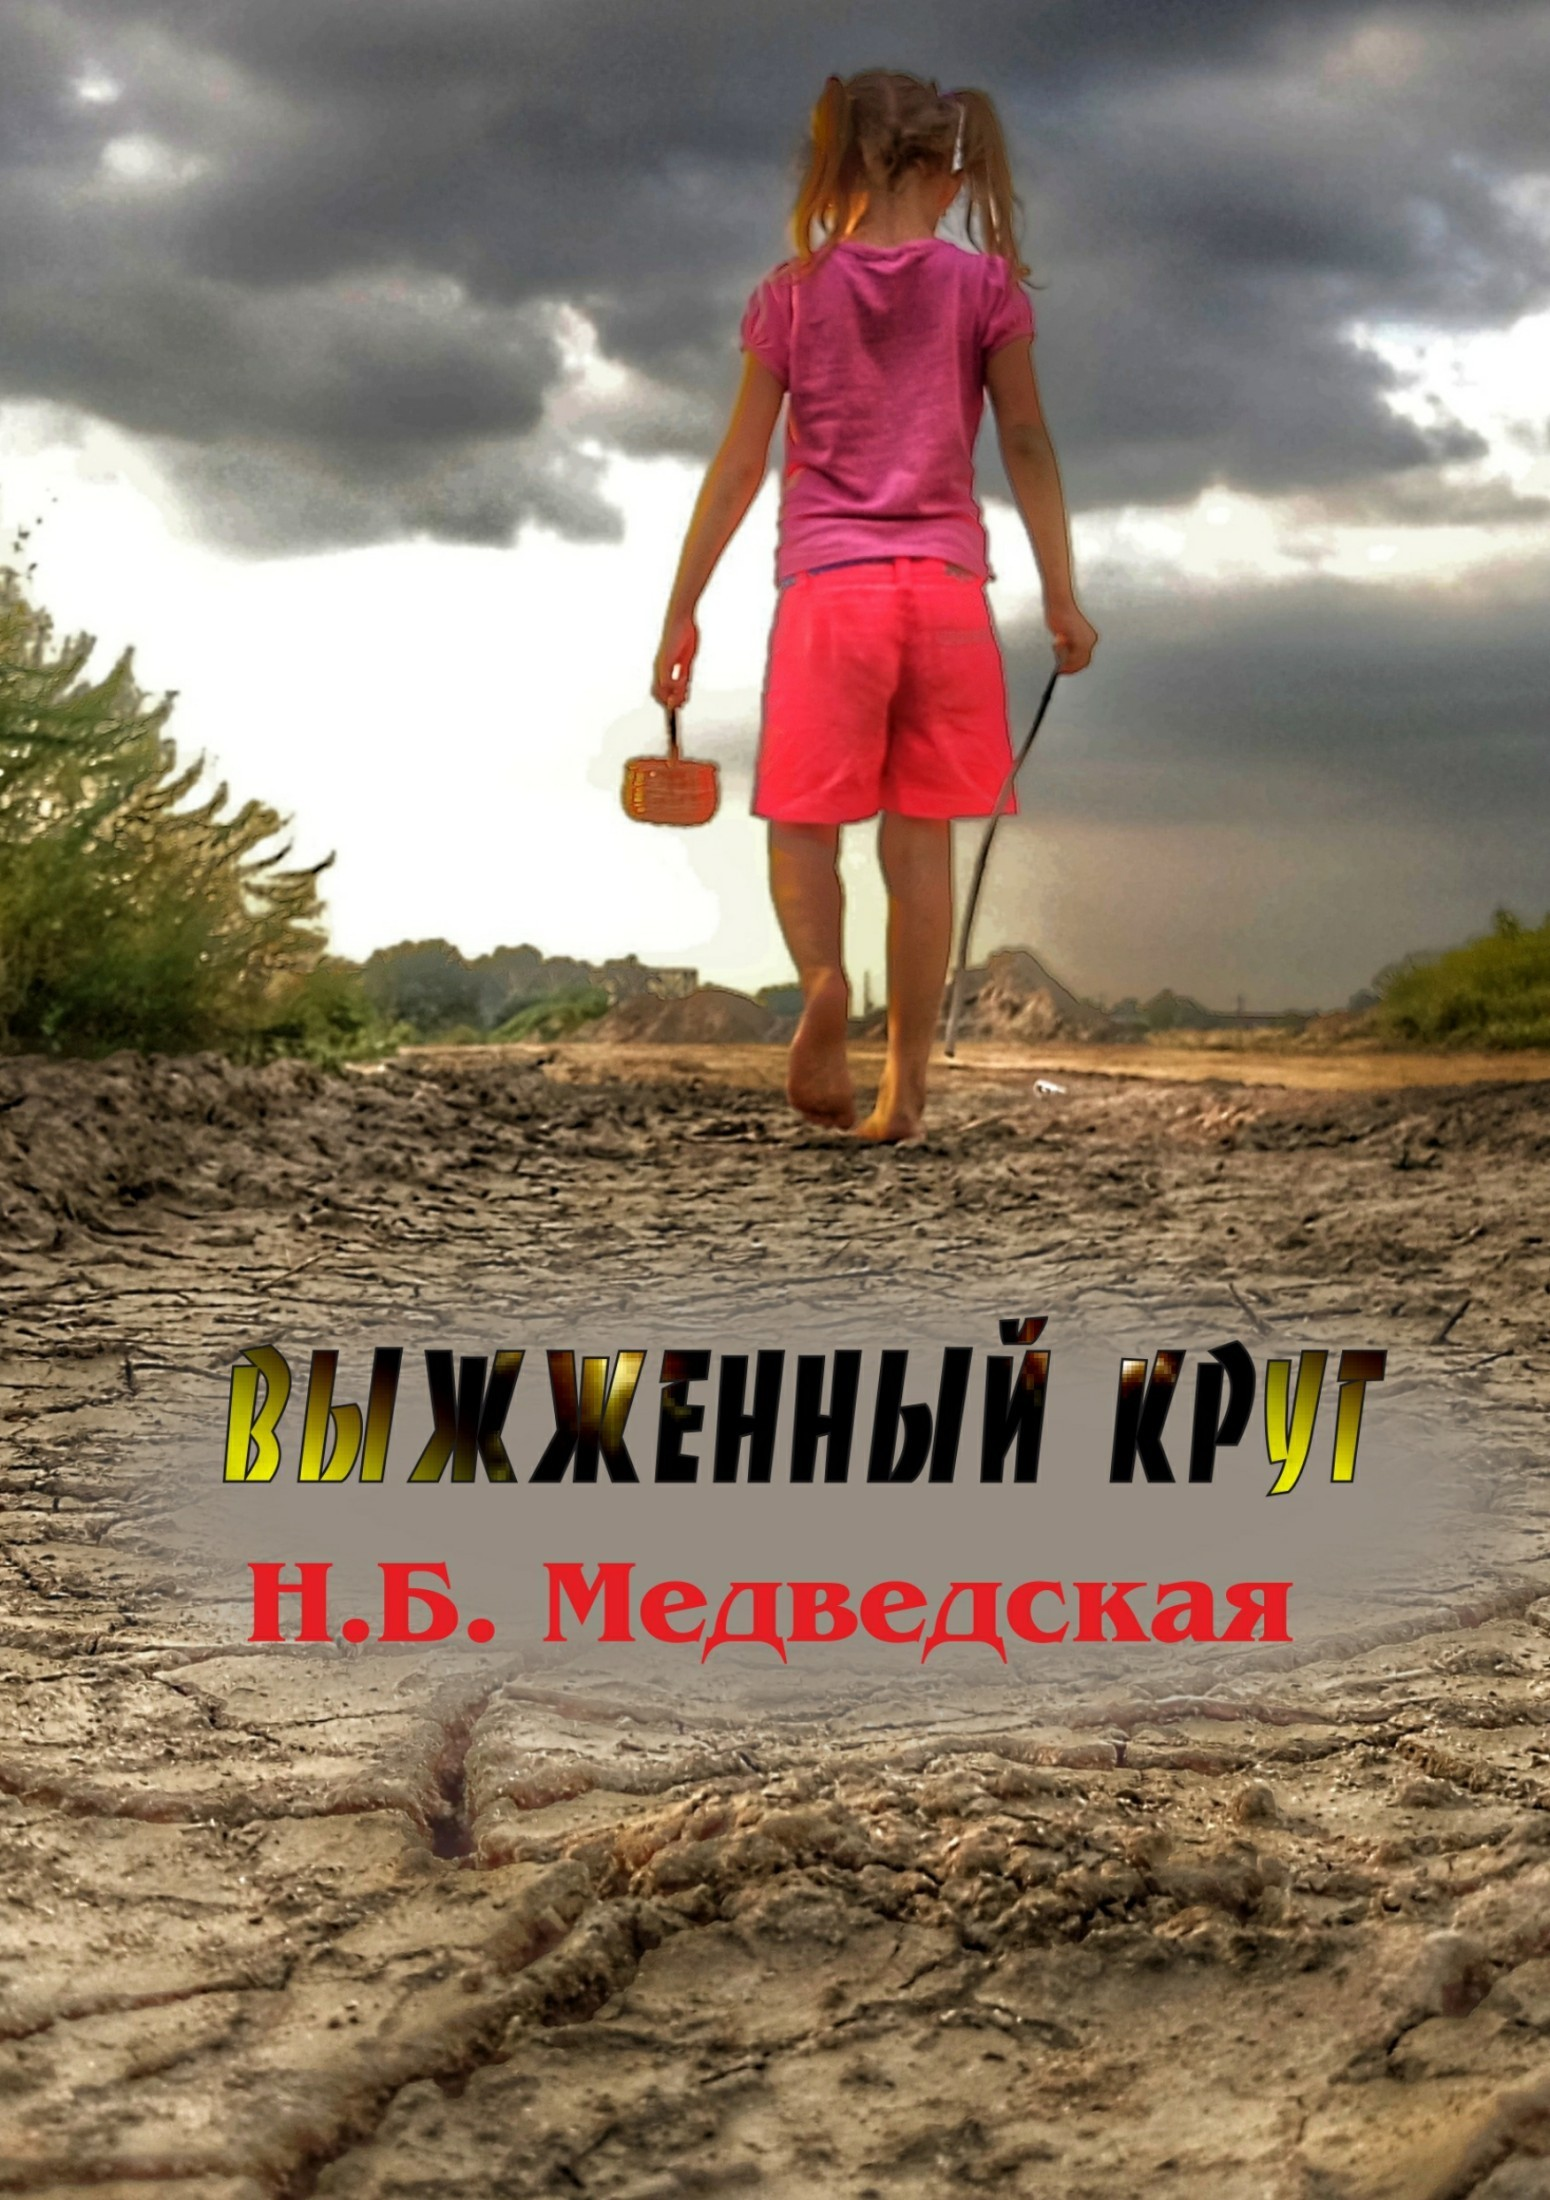 Наталья Брониславовна Медведская Выжженный круг наталья медведская выжженный круг